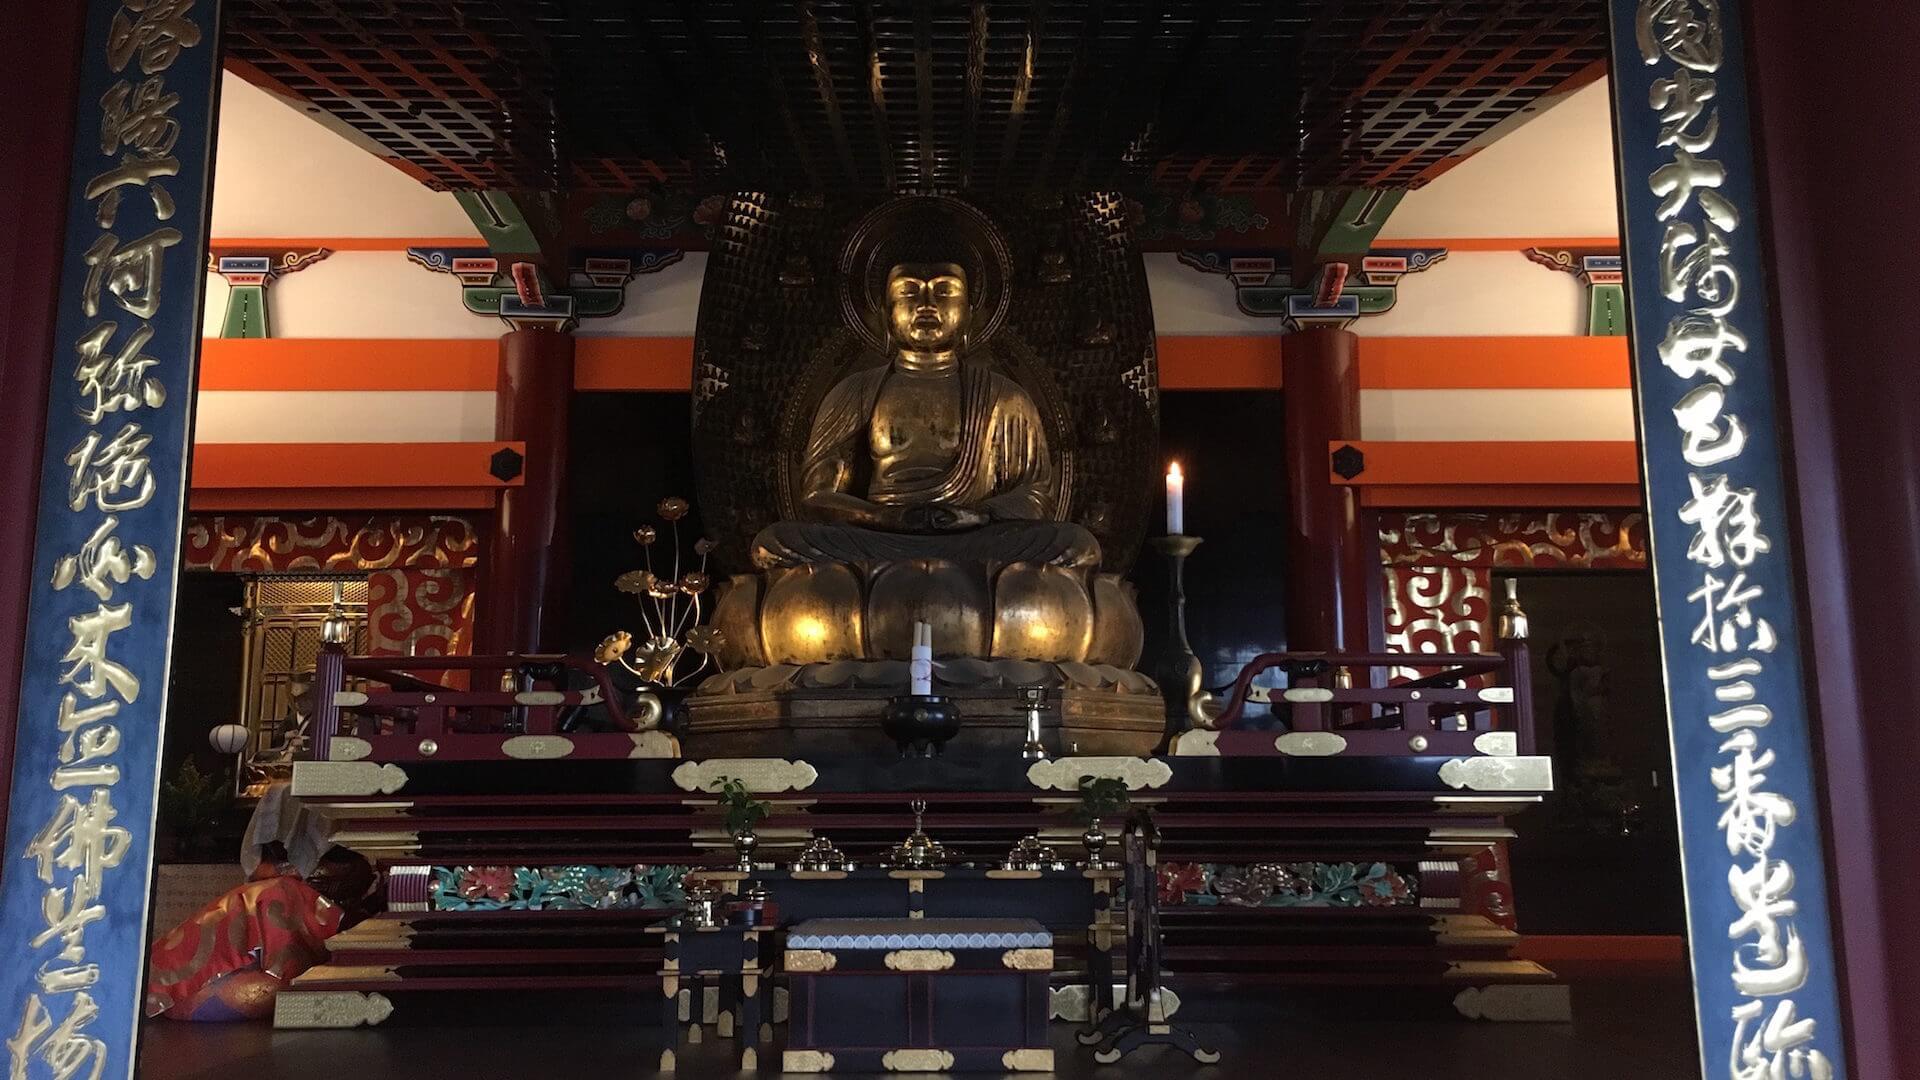 Kyoto, Kiyomizudera 28/1/2020